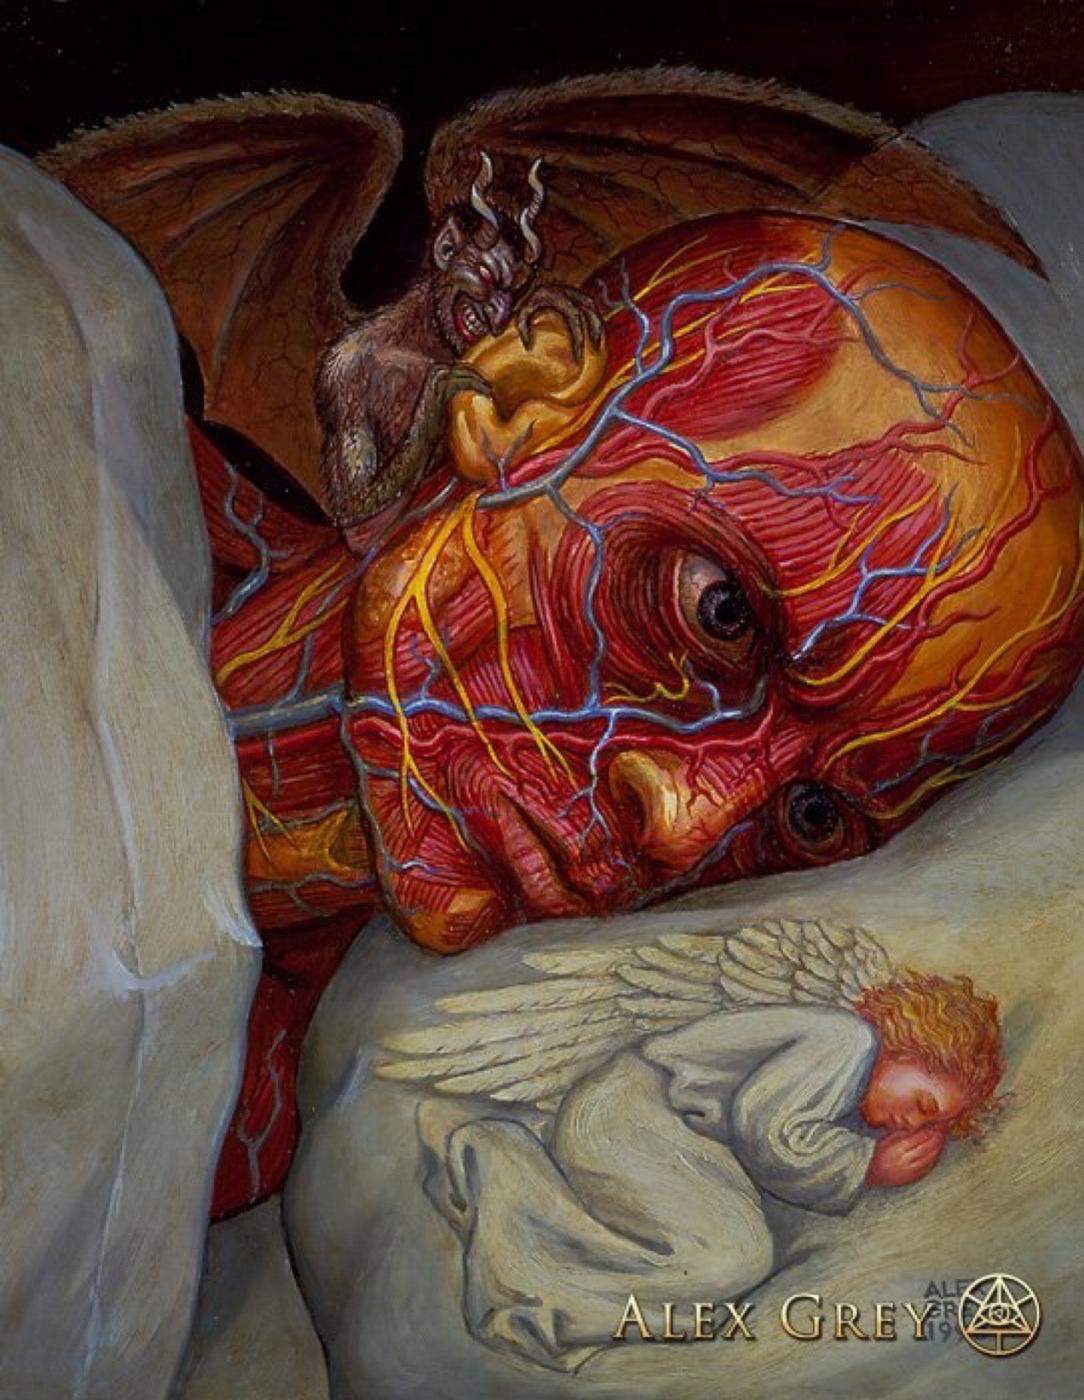 Alex Gray. Insomnia